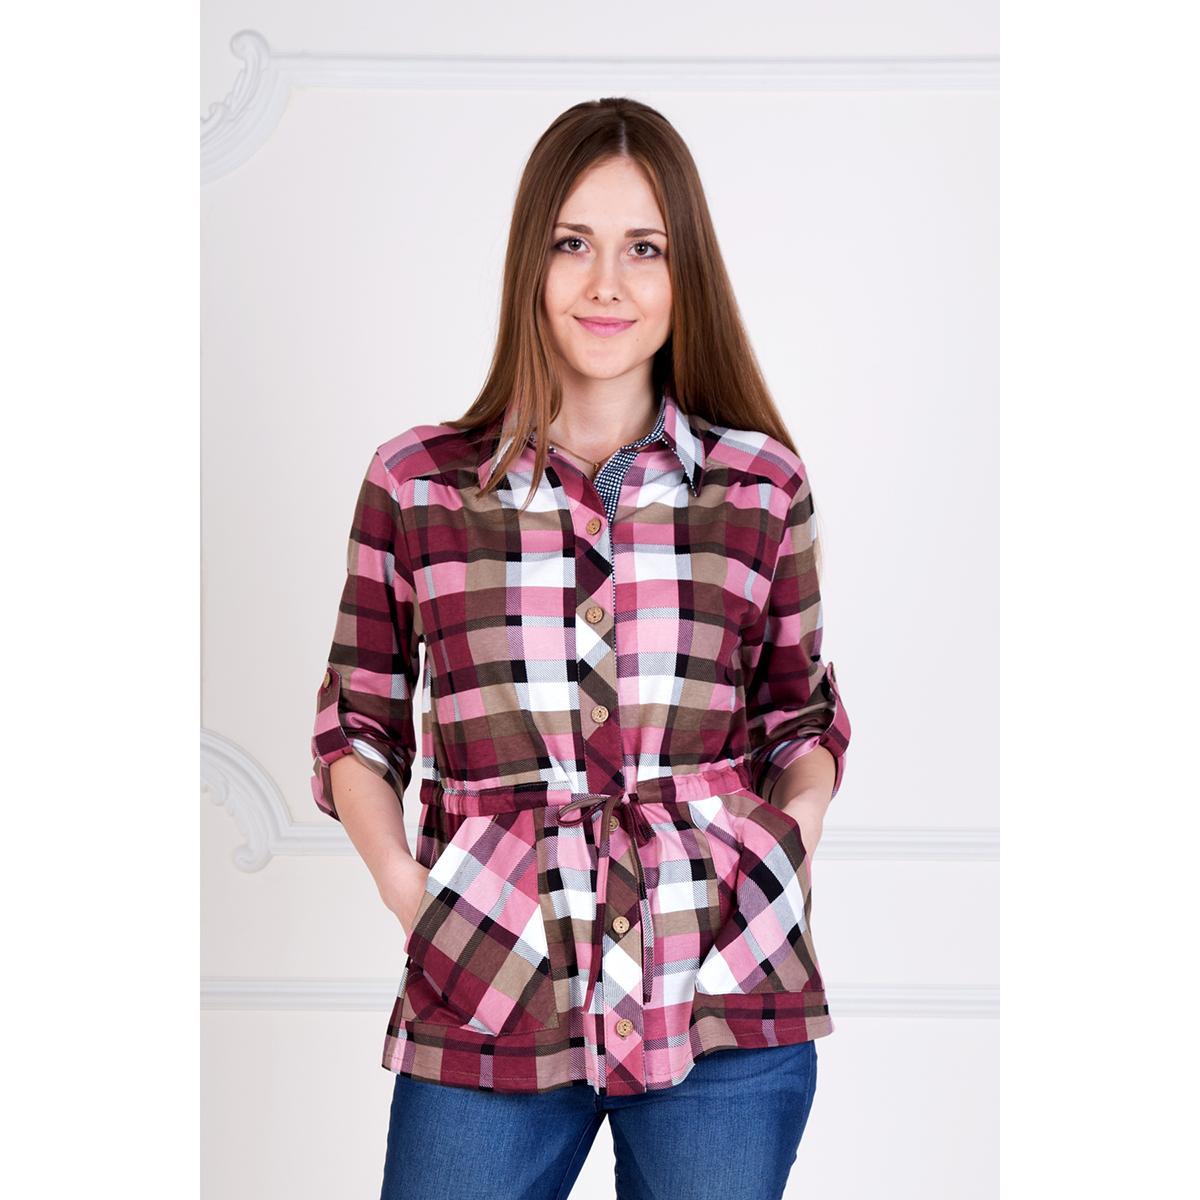 Женская рубашка Клетка Брусничный, размер 60Рубашки<br>Обхват груди:120 см<br>Обхват талии:101 см<br>Обхват бедер:128 см<br>Рост:167 см<br><br>Тип: Жен. рубашка<br>Размер: 60<br>Материал: Кулирка